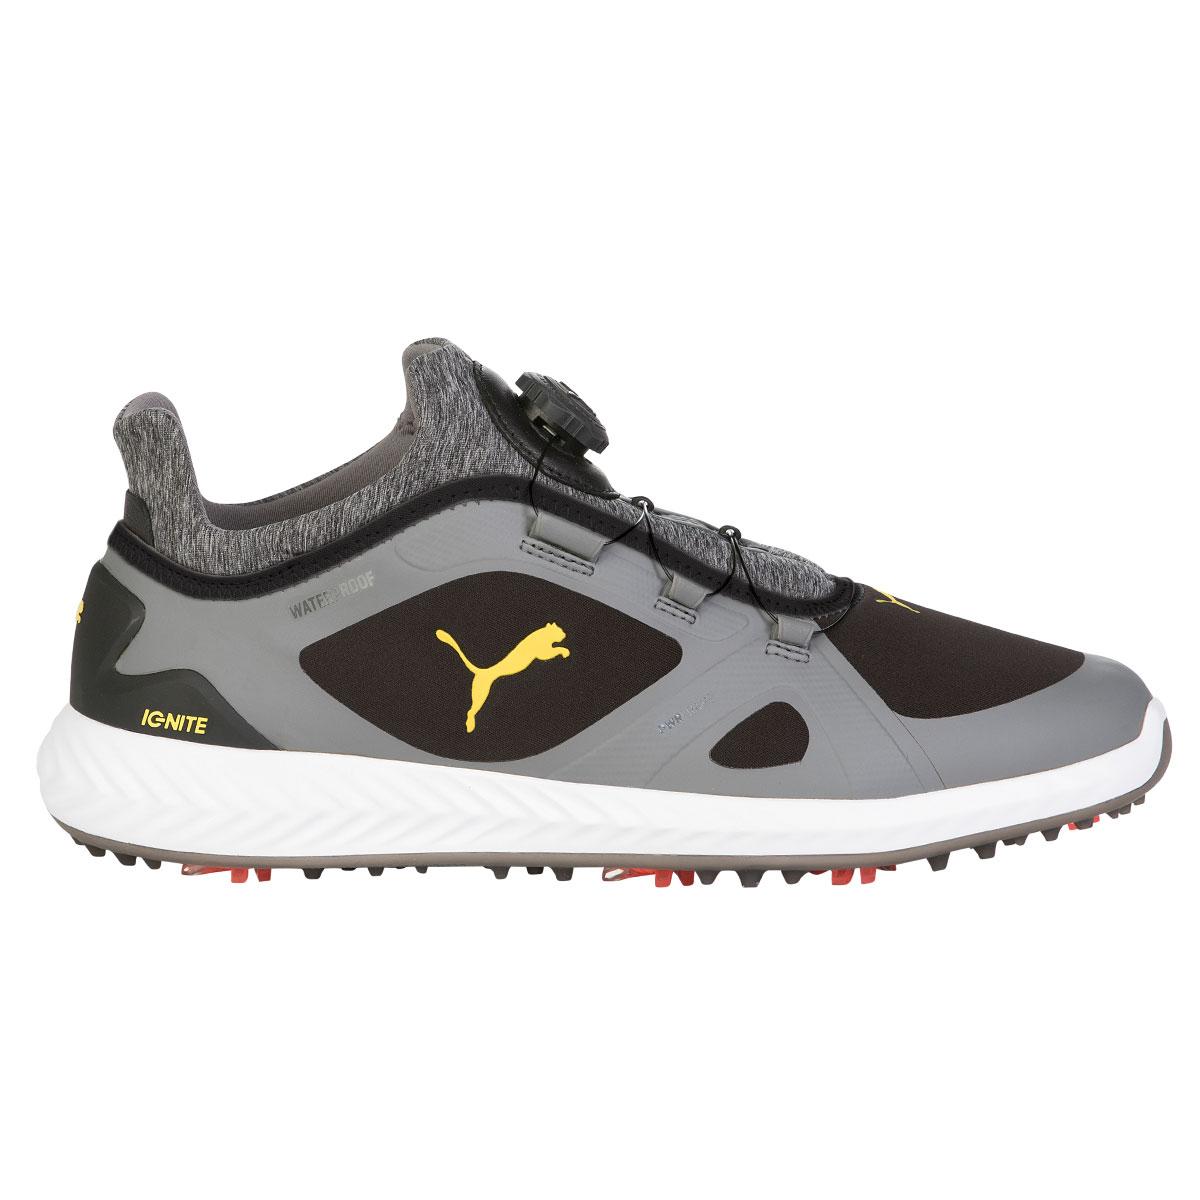 Puma Golf Hommes Ignite PWRadapt Chaussures de Golf étanche